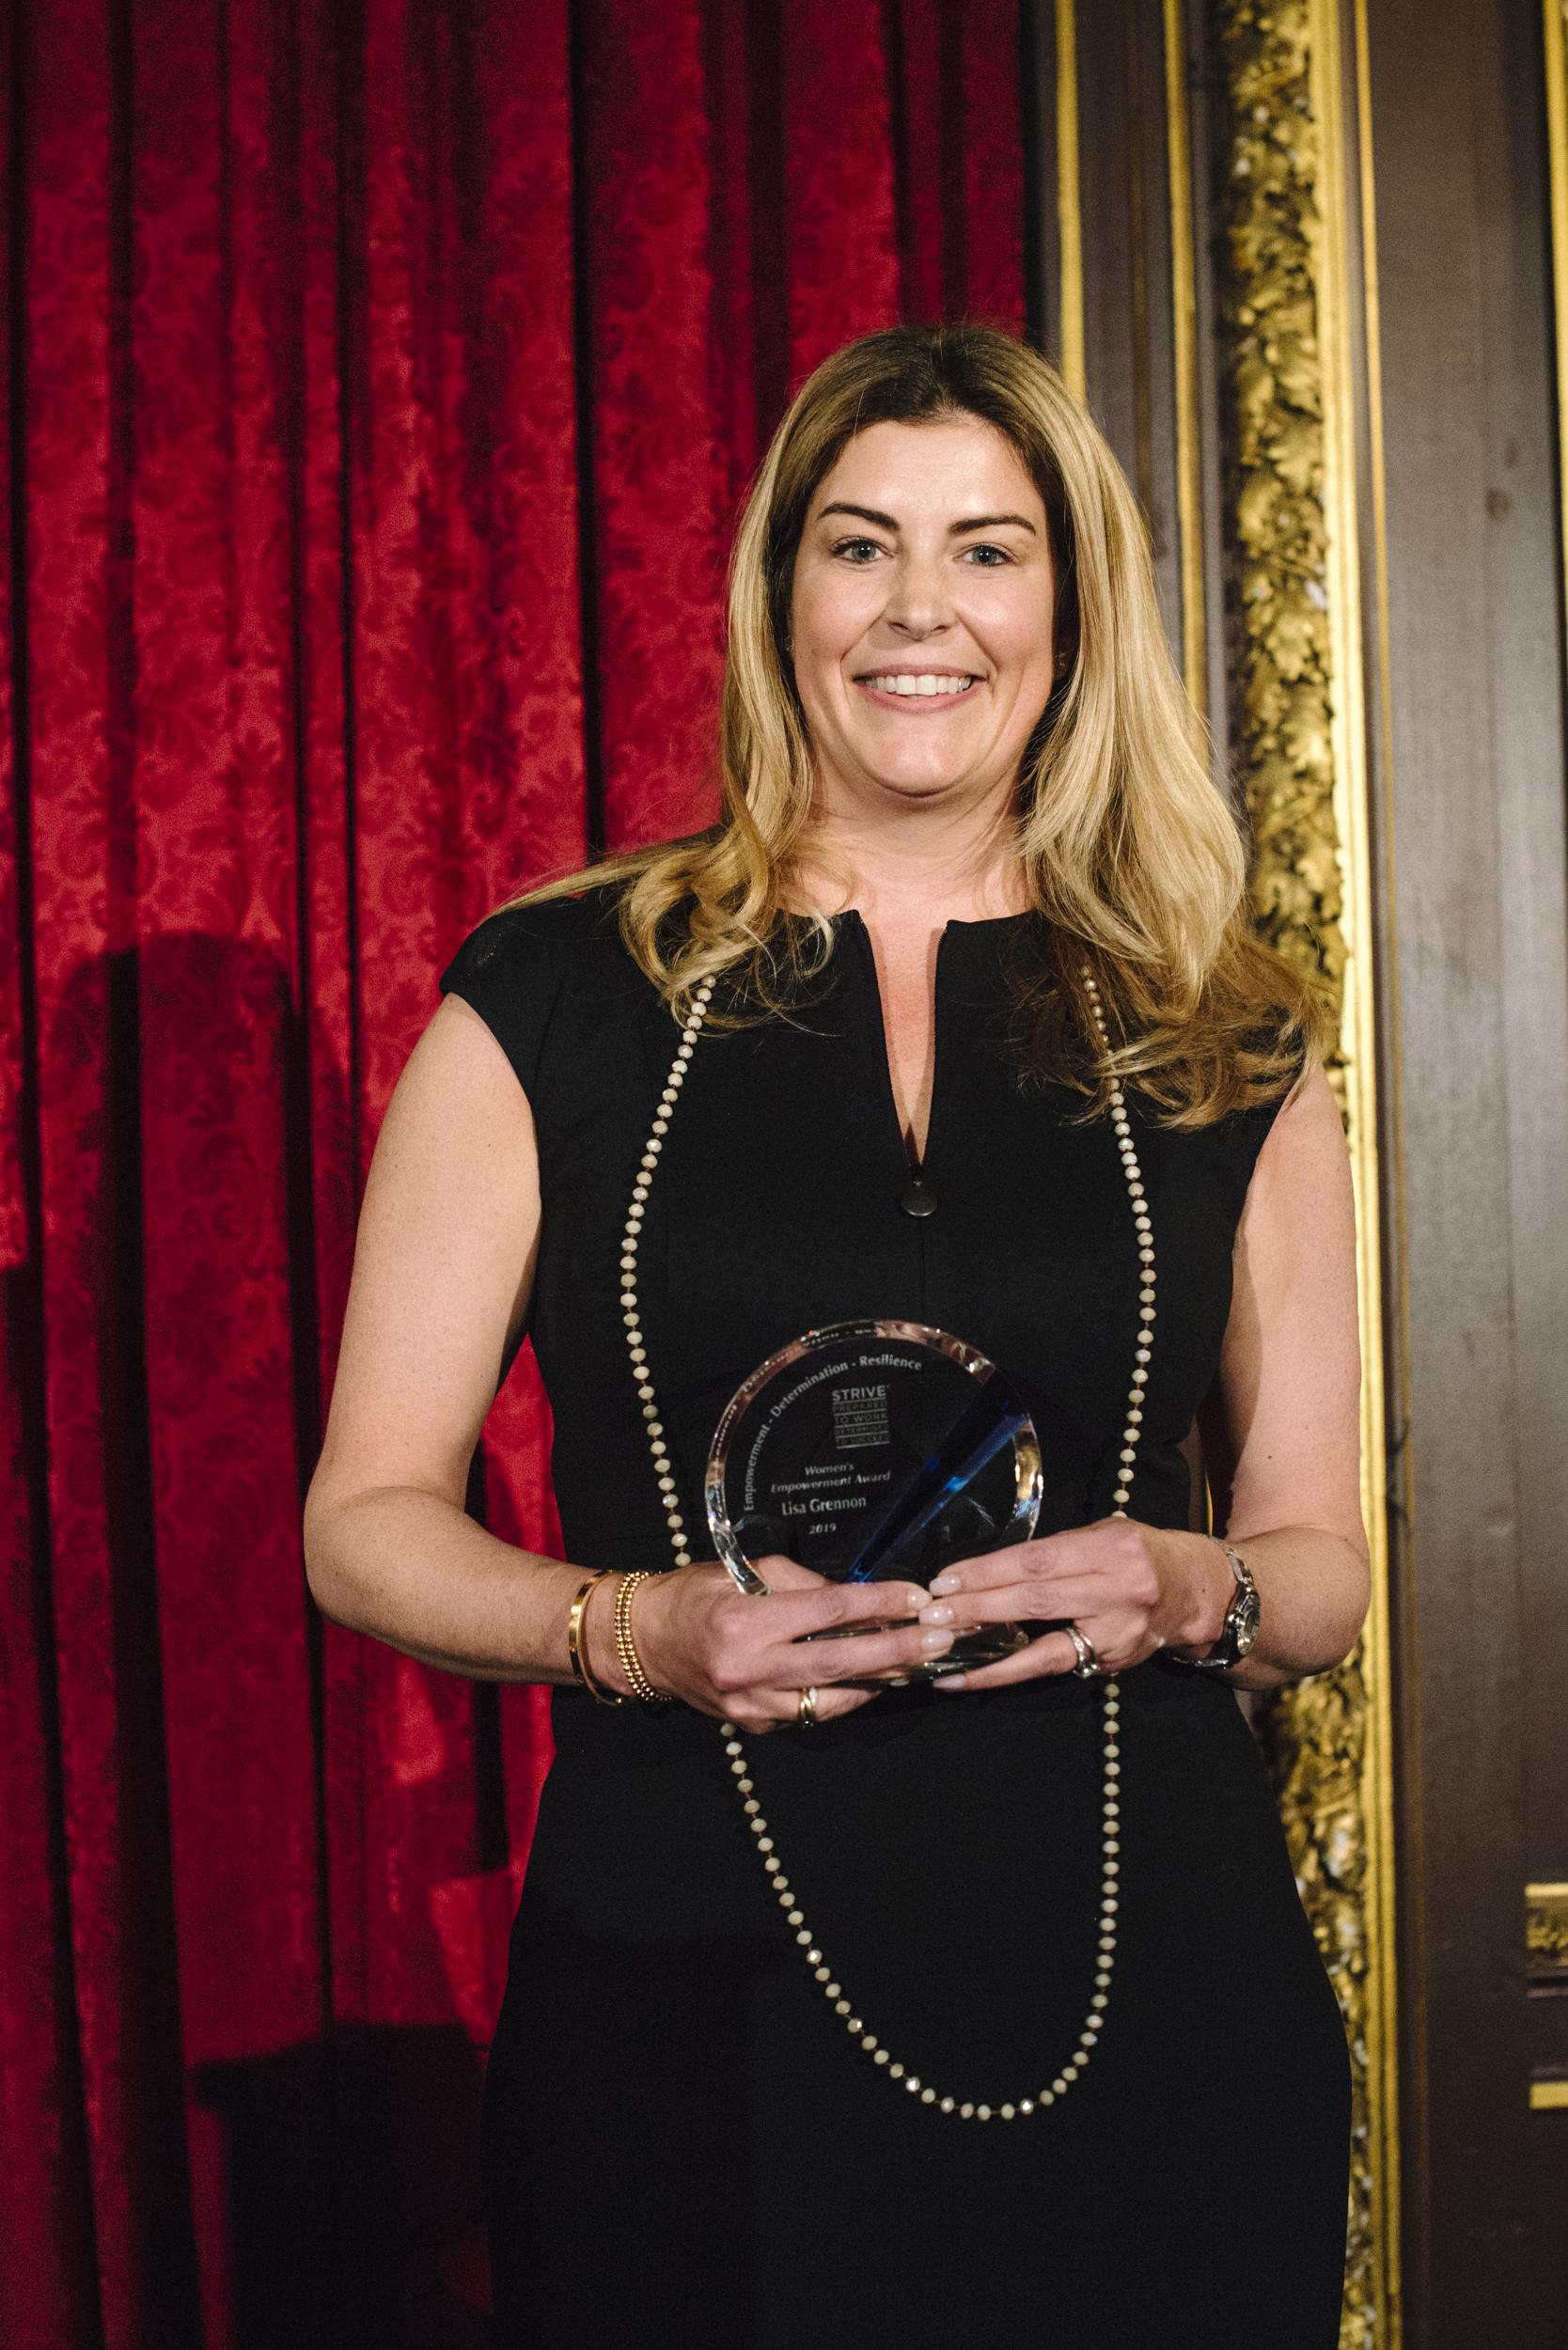 Lisa with Award.jpg